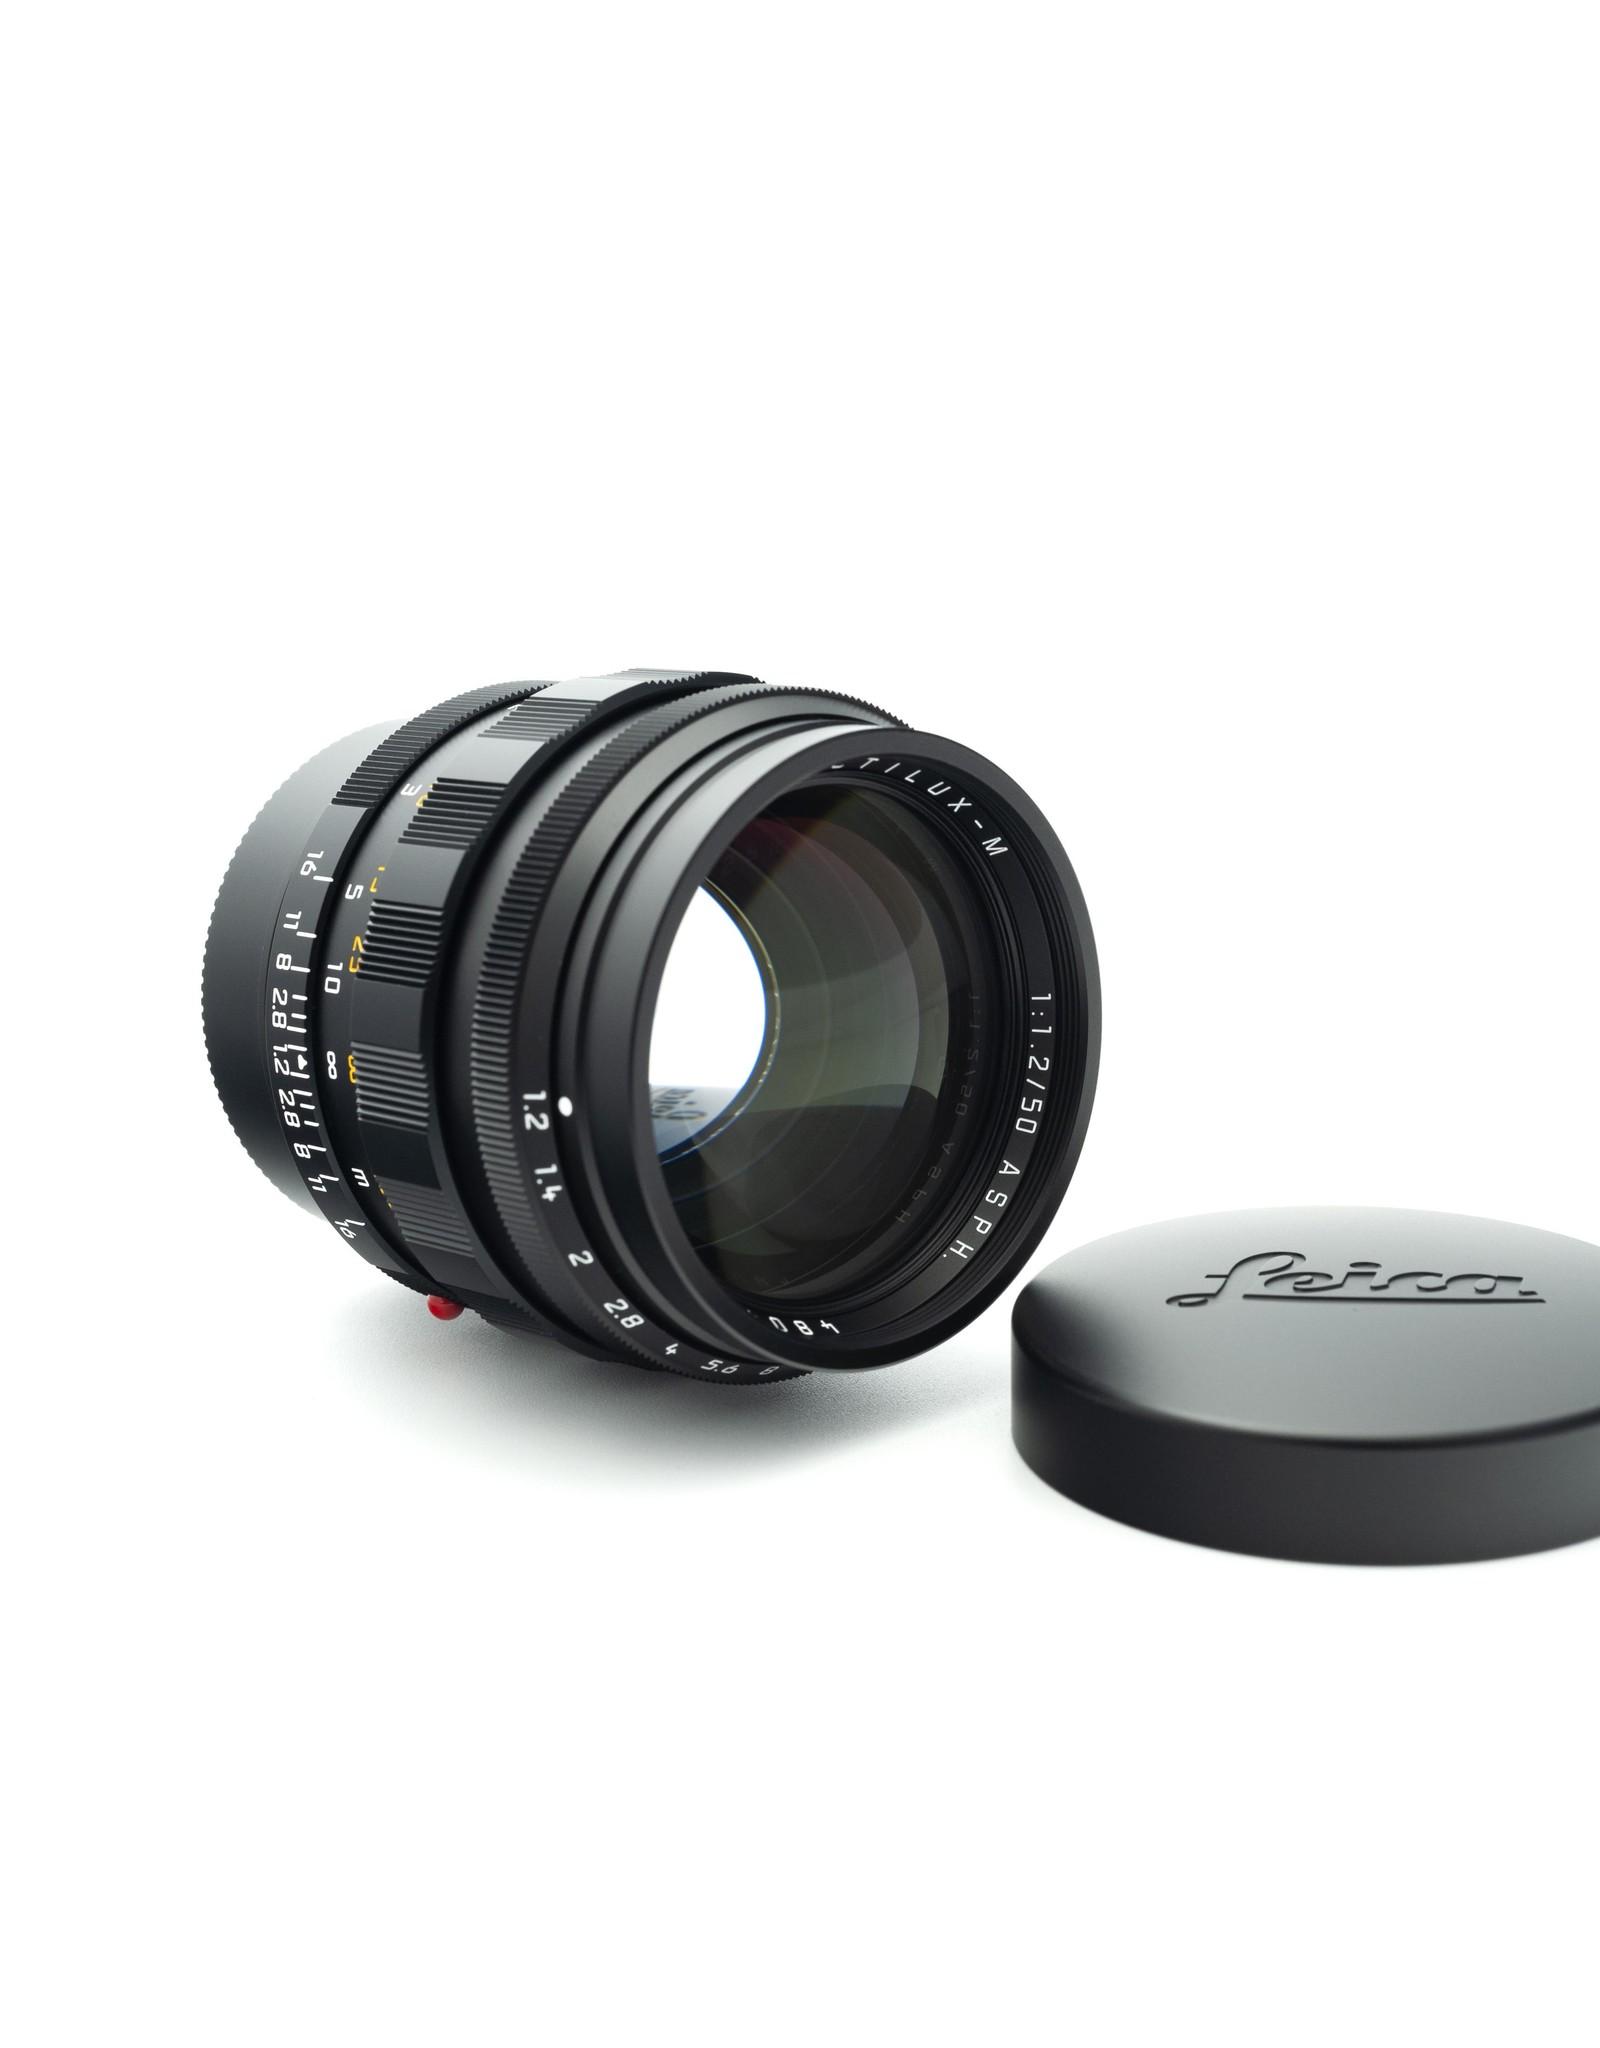 Leica Leica 50mm f1.2 Noctilux-M ASPH Black Chrome 116-86